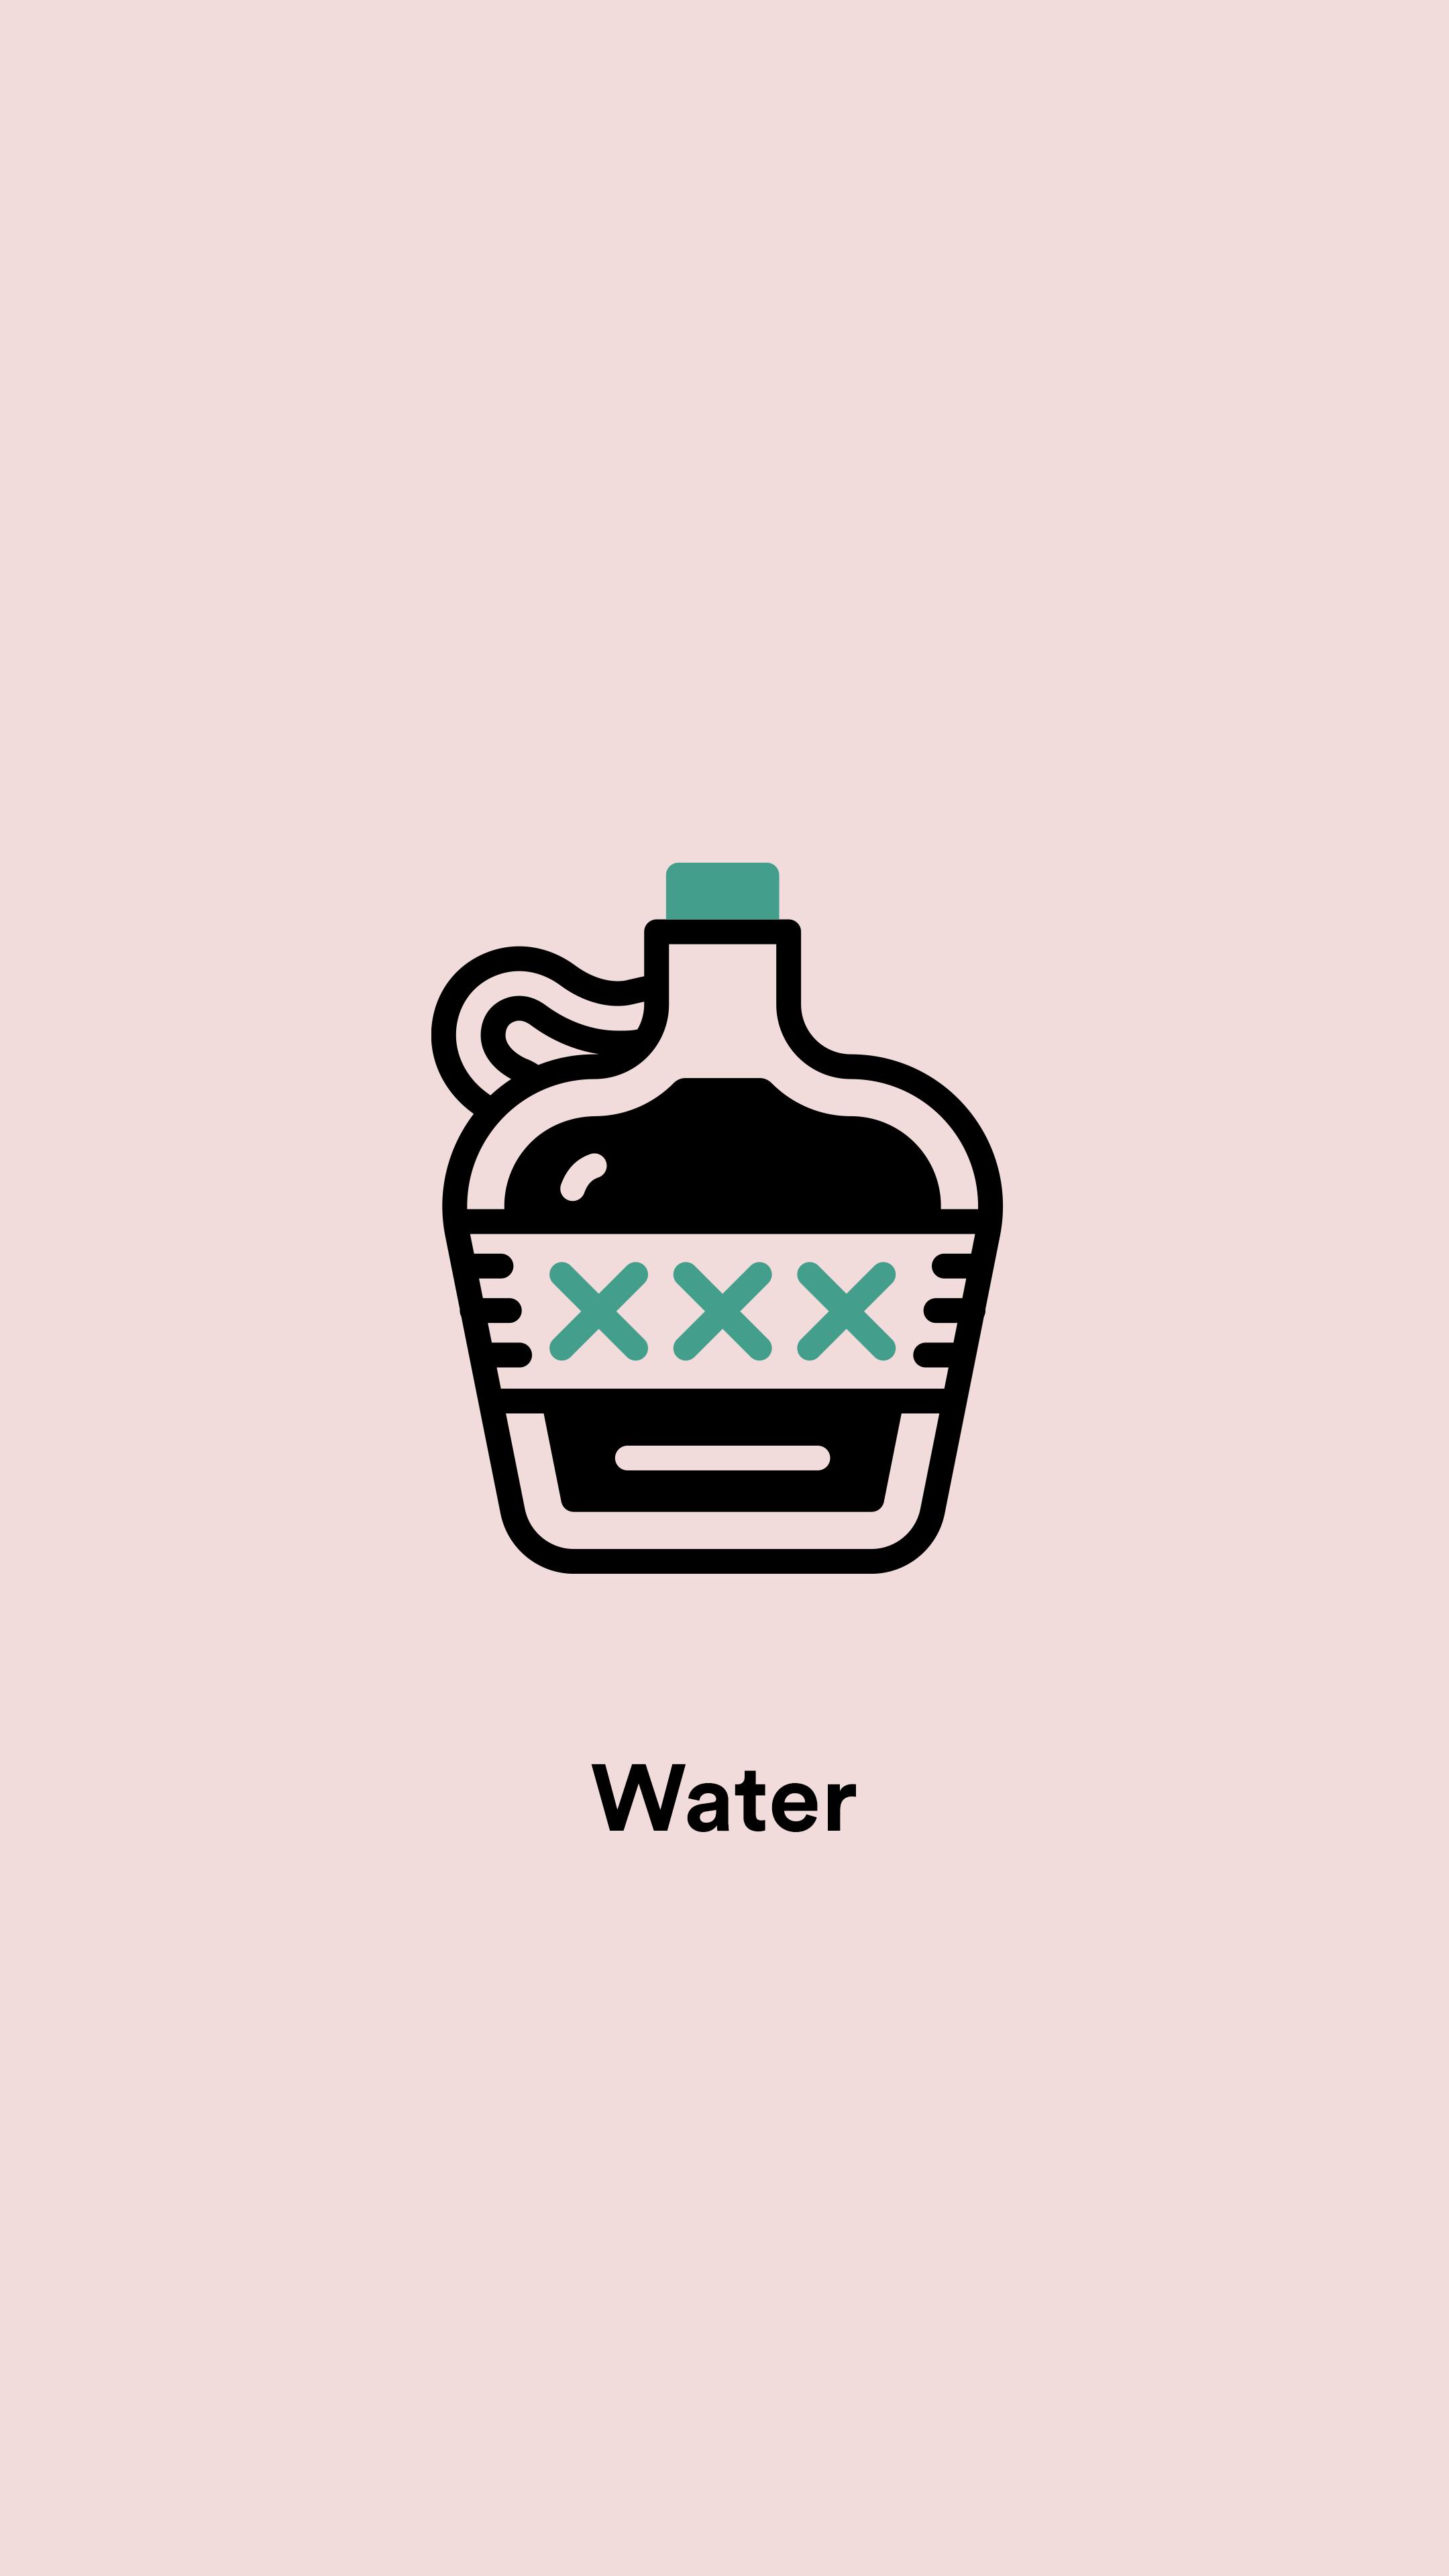 Office Signage For Lola Mullenlowe Paris Illustratrion Icondesign Water Alcohol